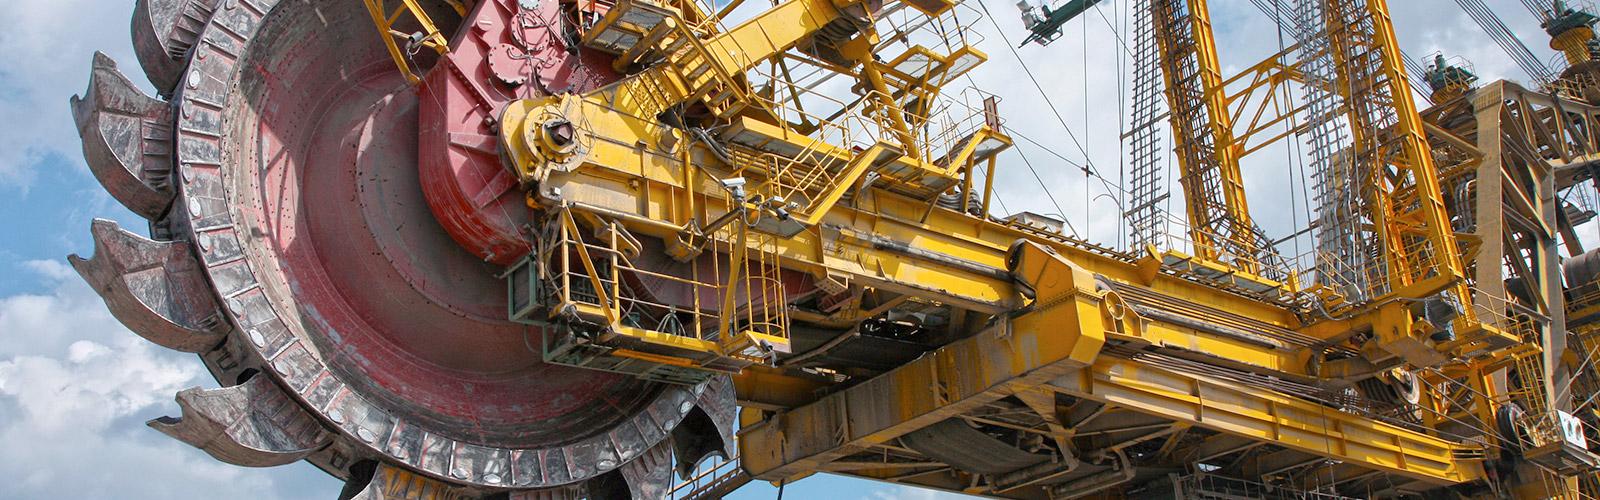 Huge Mining Excavator